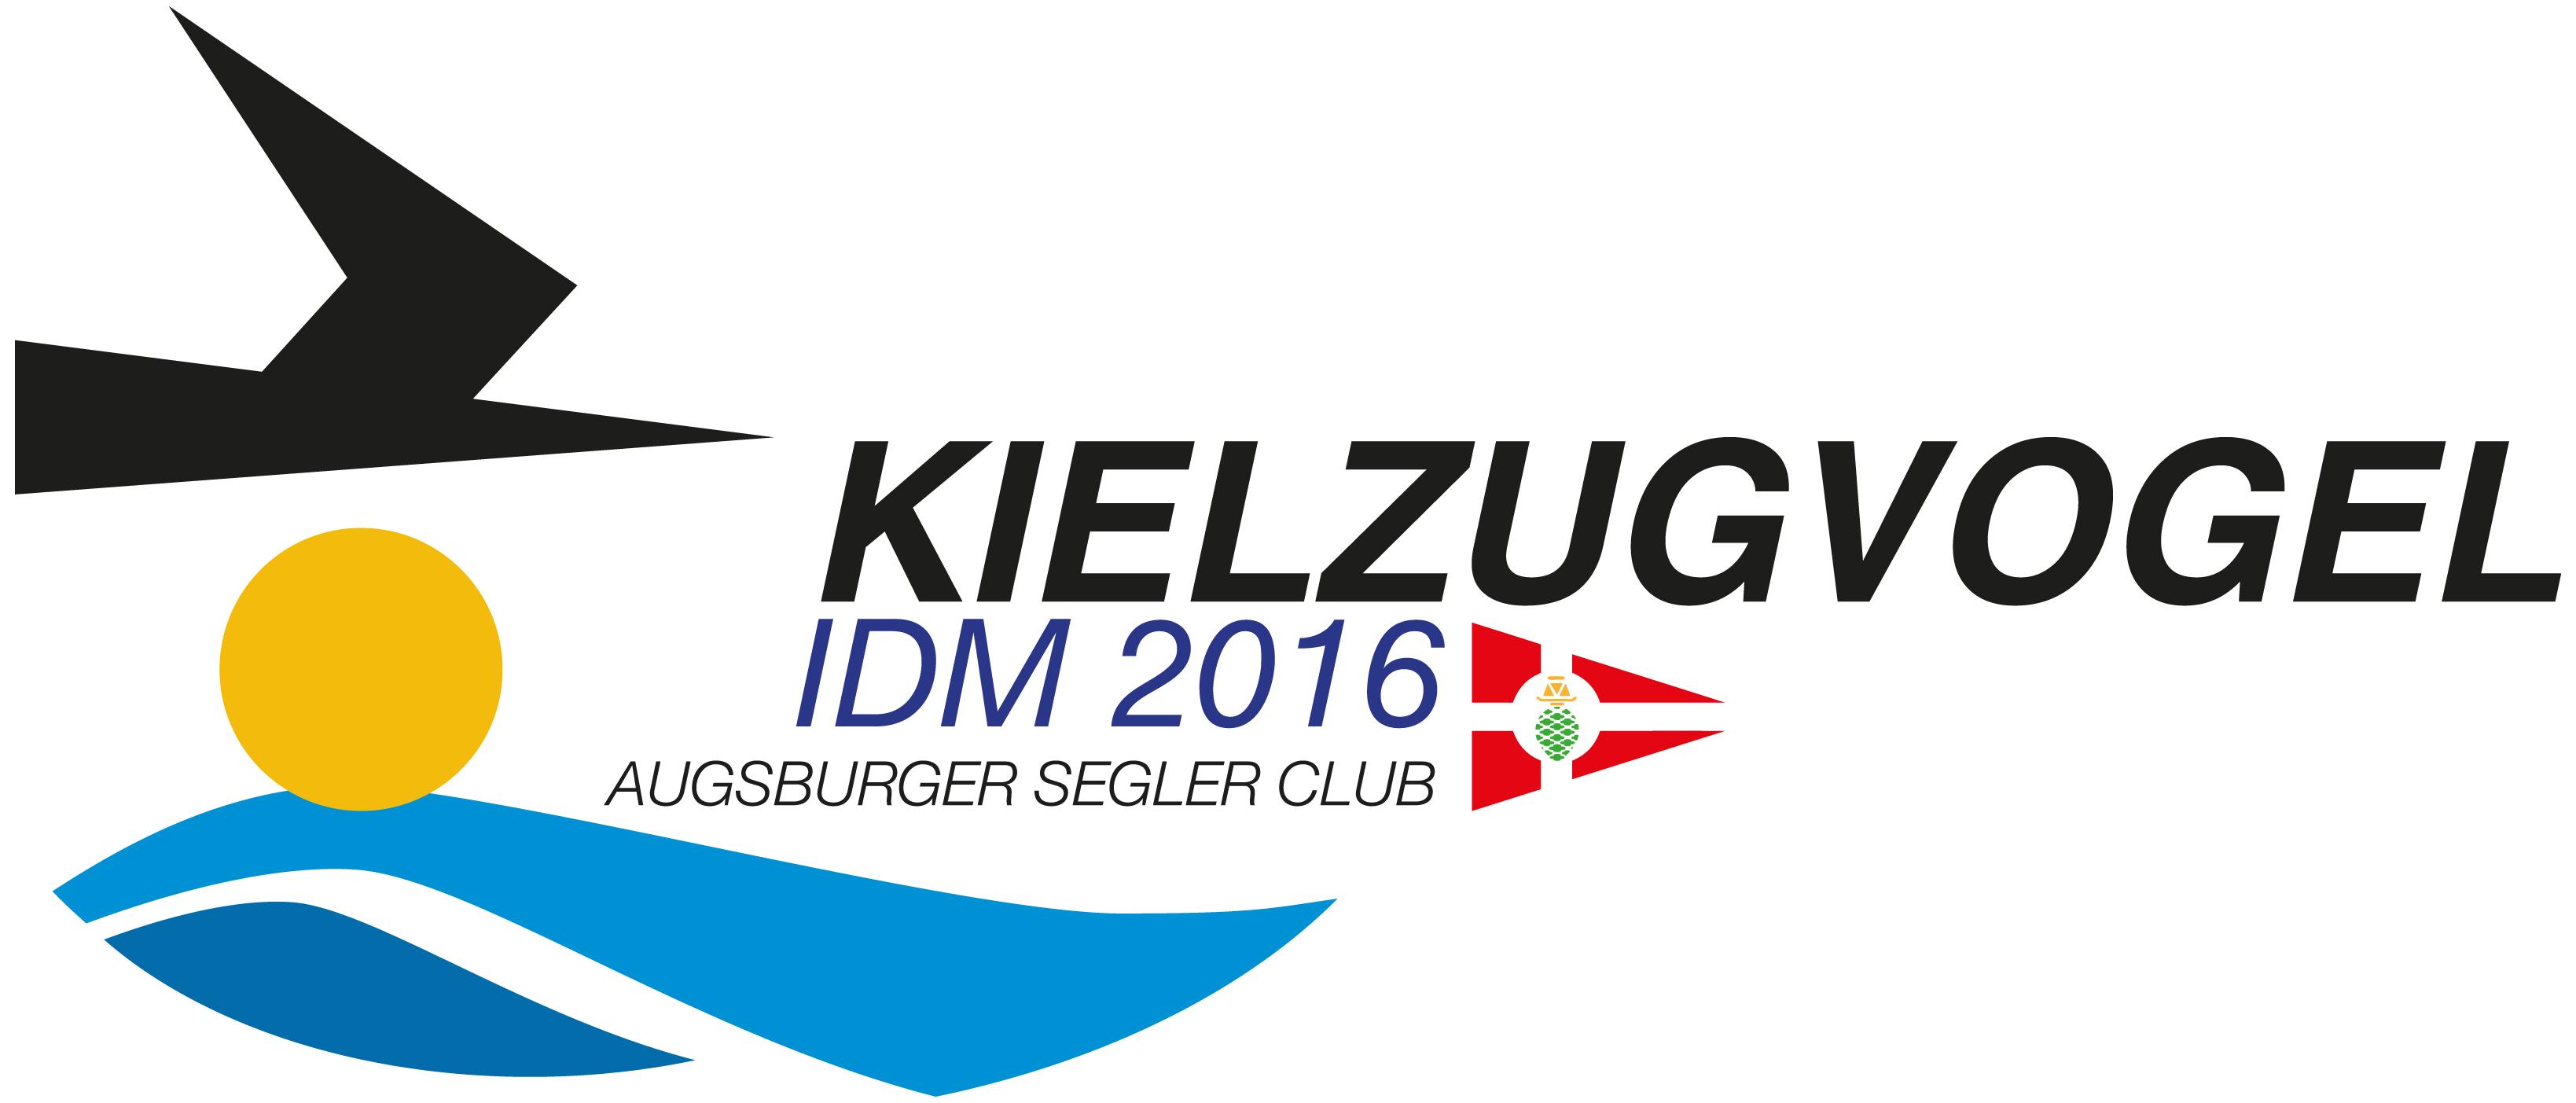 Kielzugvogel IDM Logo